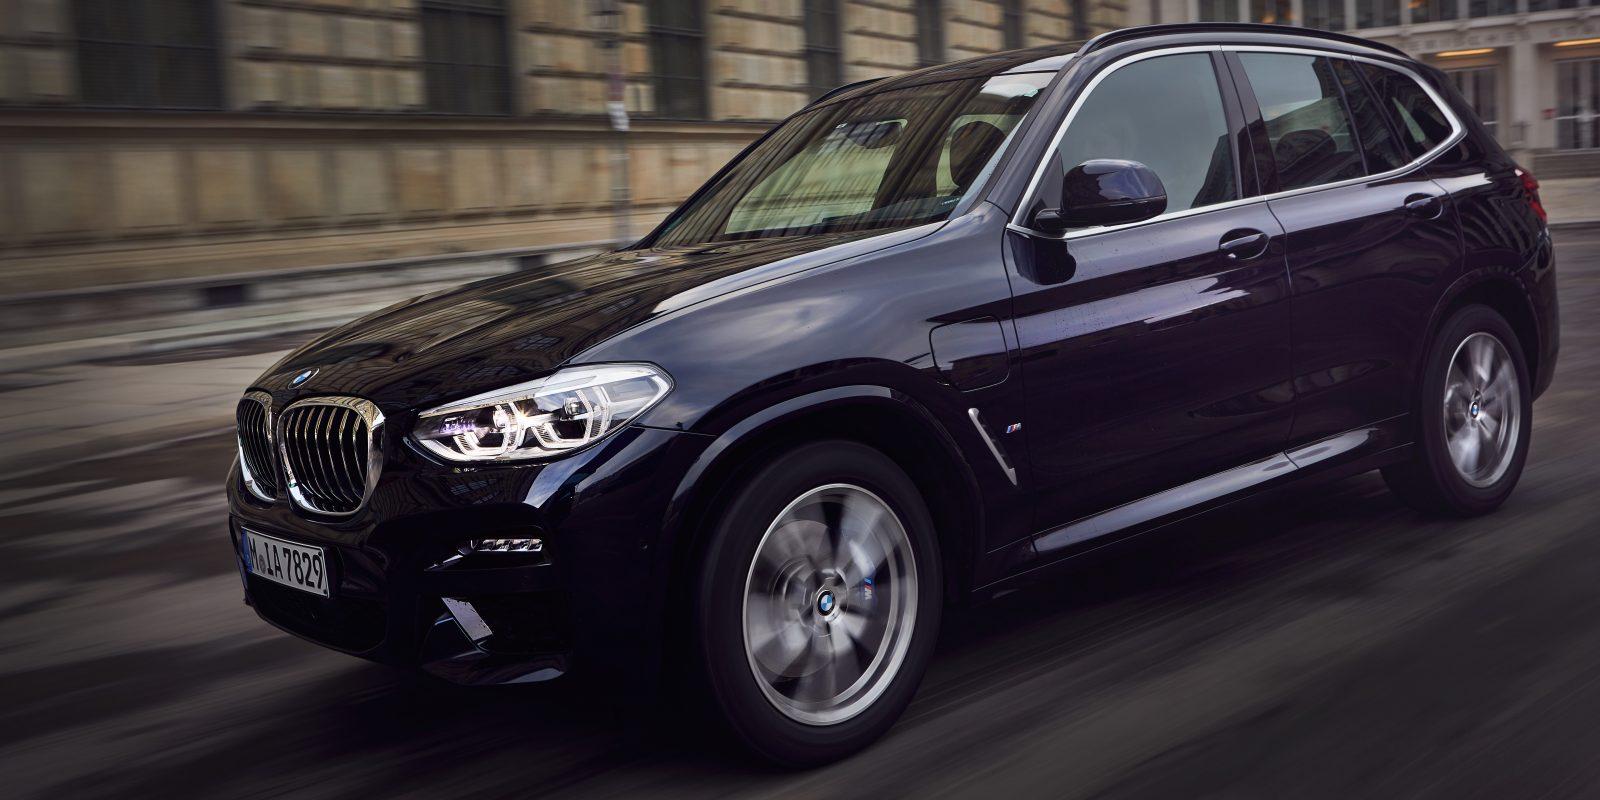 BMW PHEVs will have forced geofenced EV mode in emission-free zones, rewards